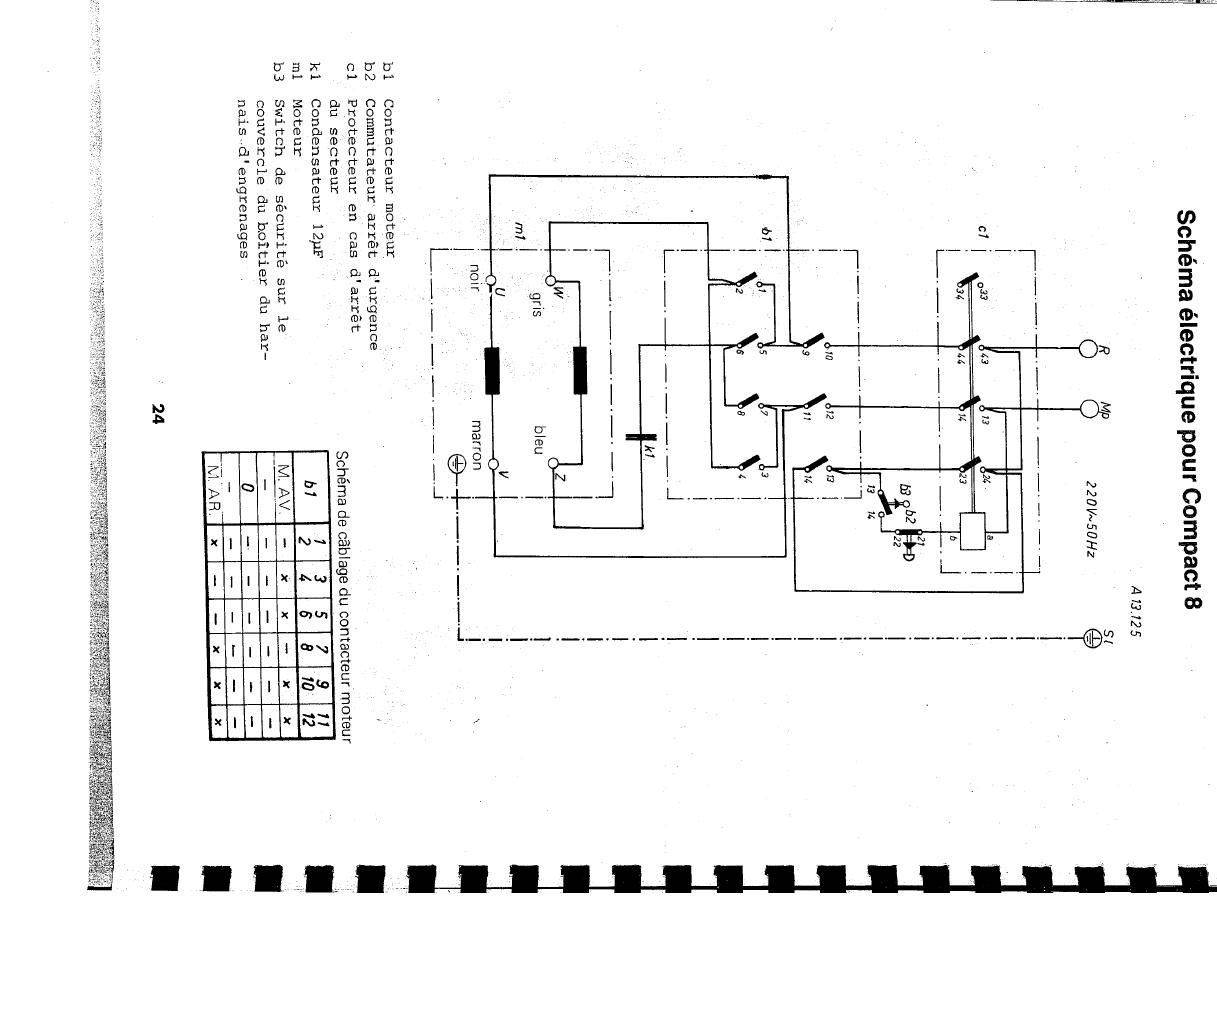 schemas electrique.JPG